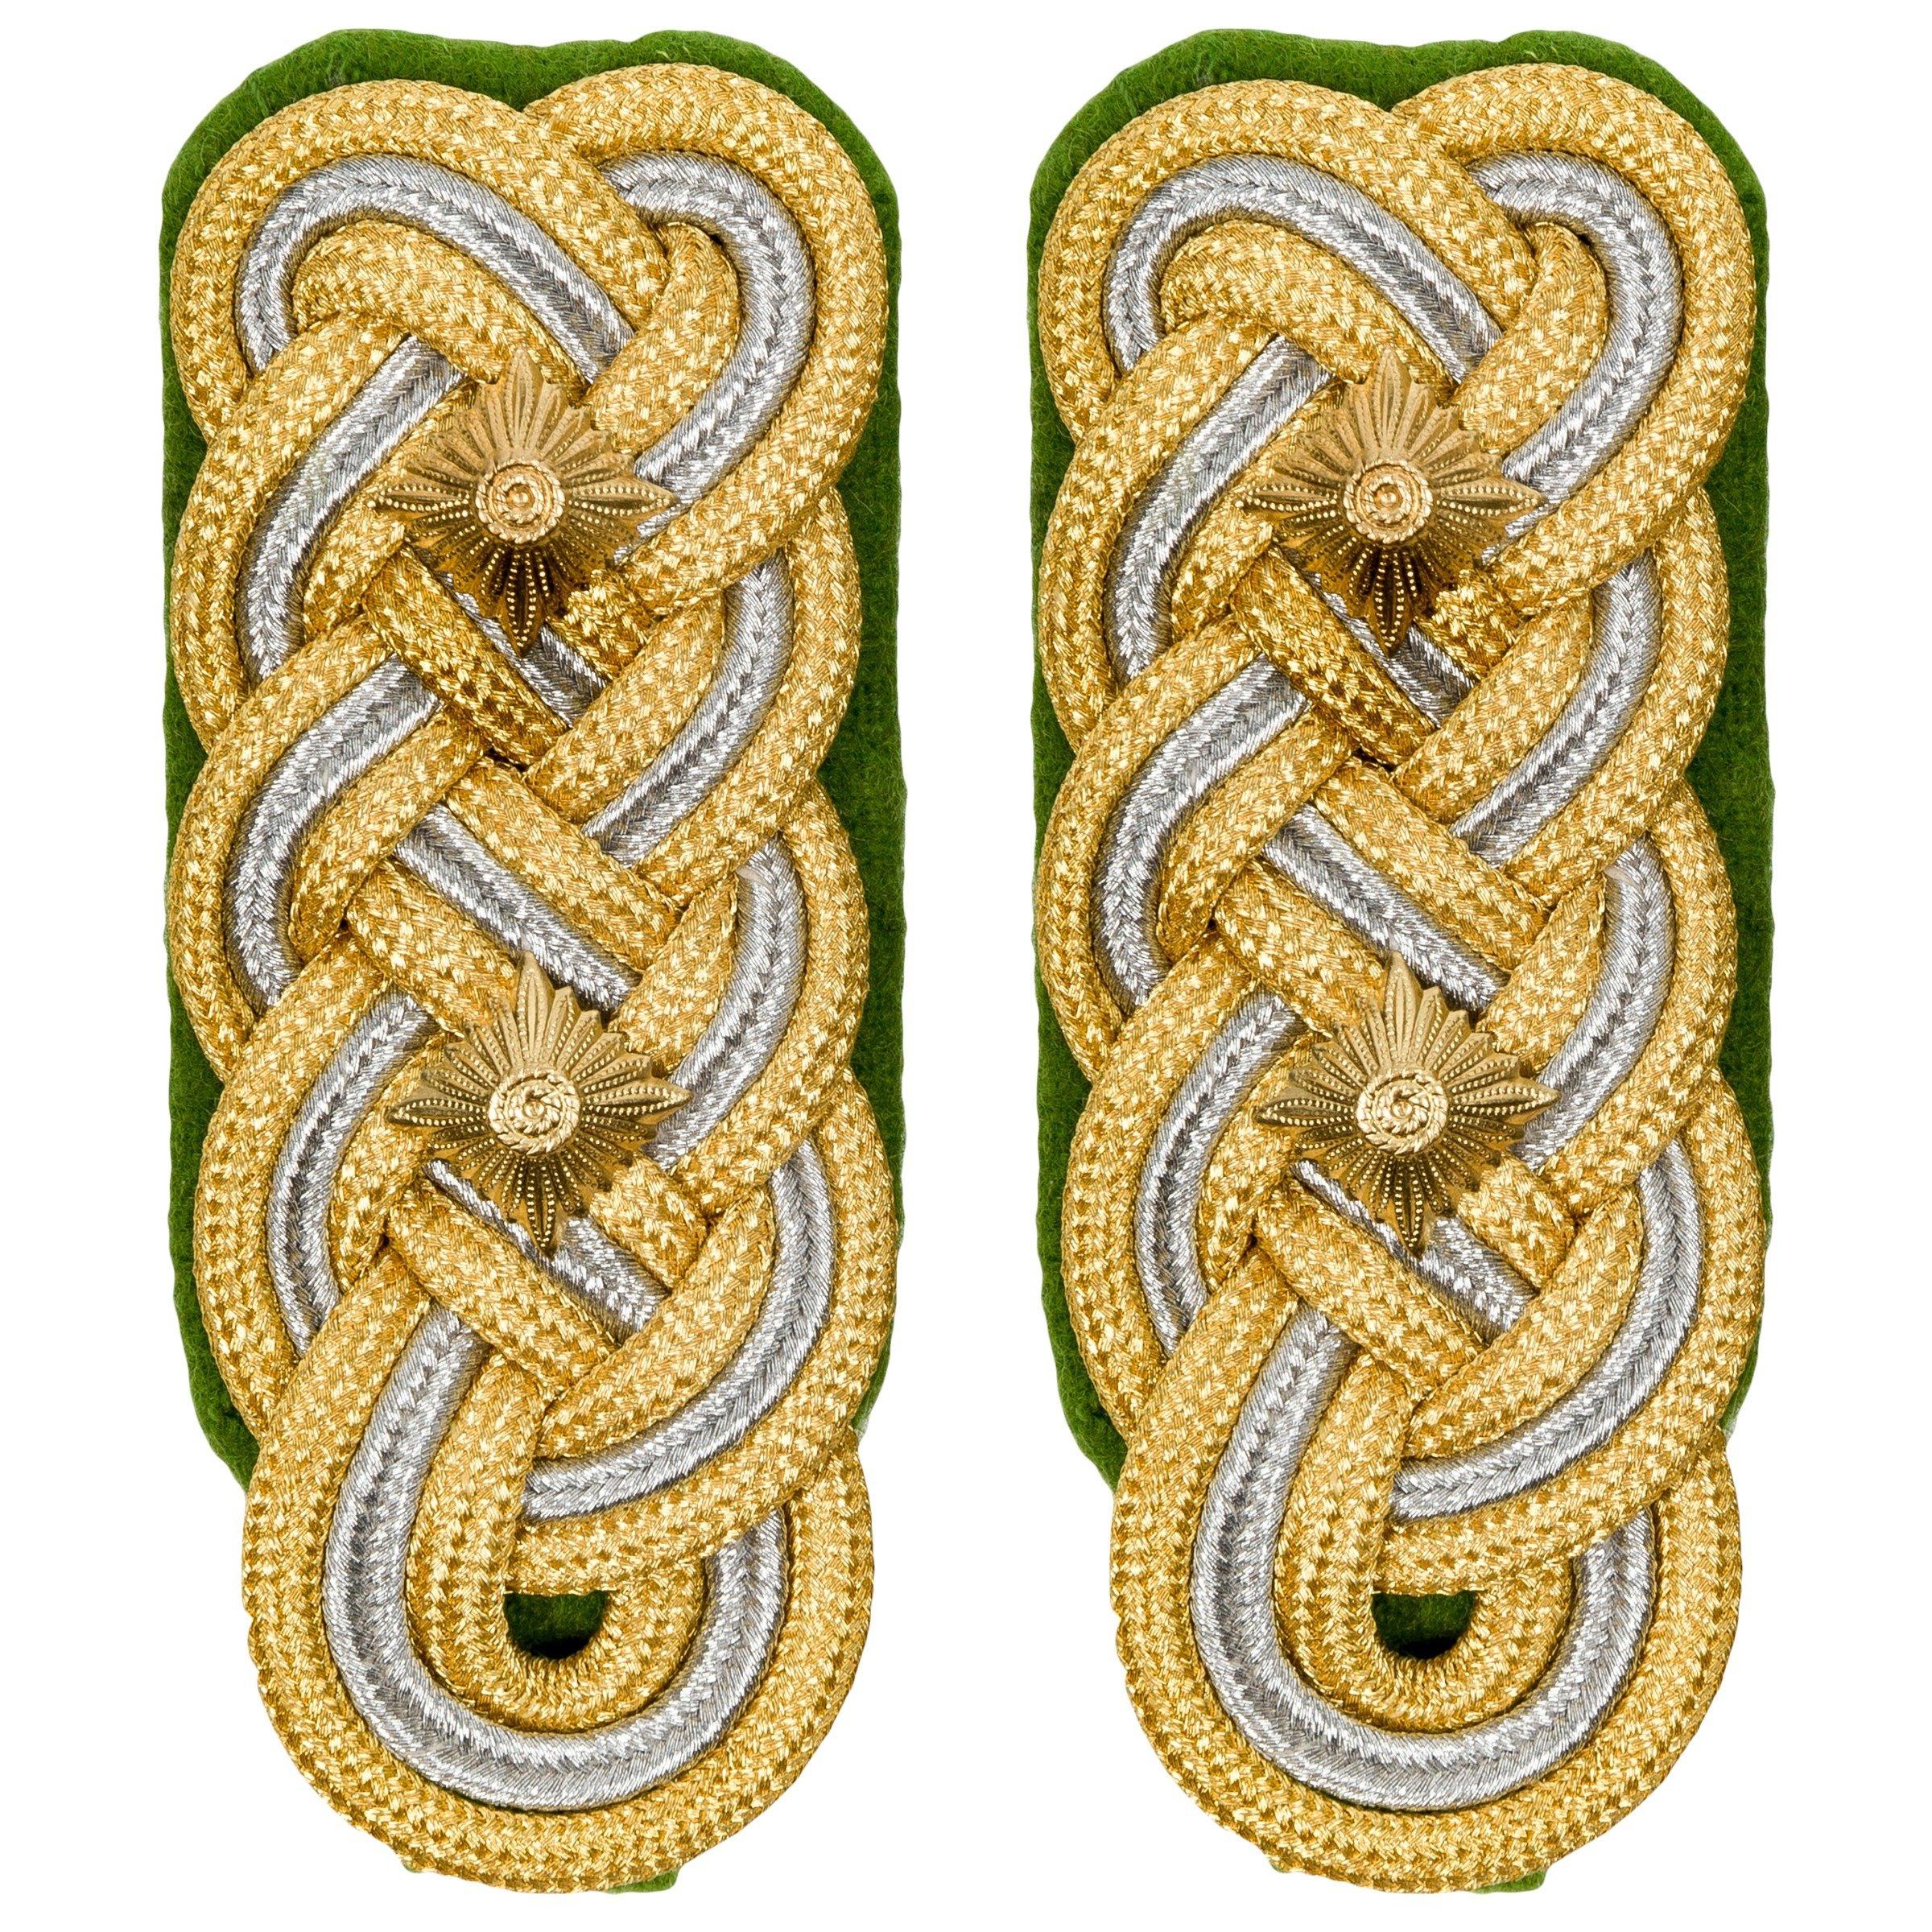 Reproduction German WW2 Police General shoulder boards